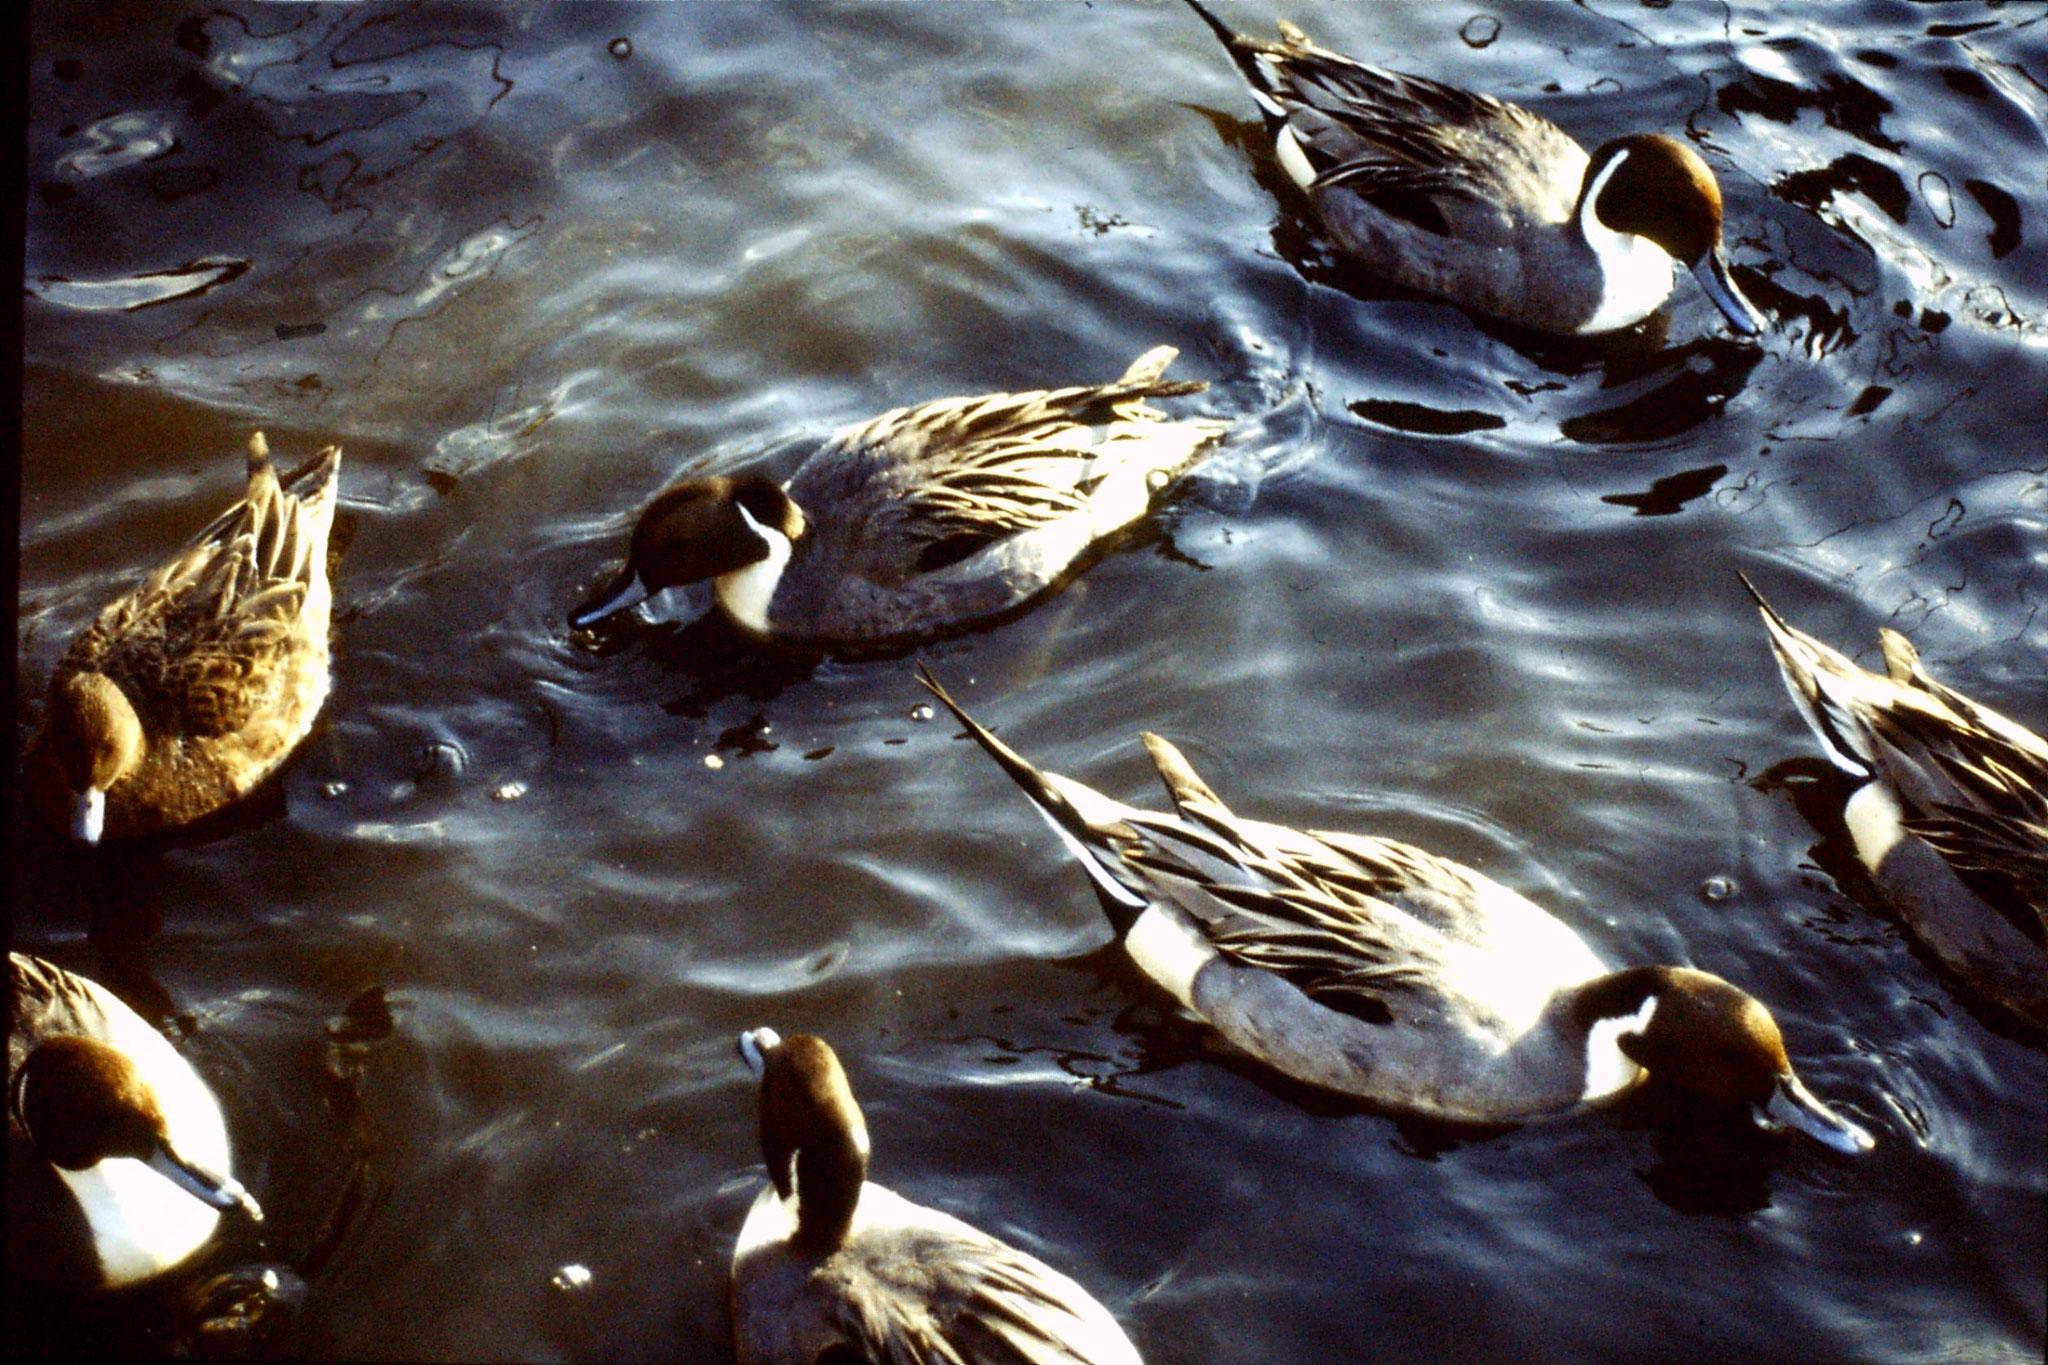 4/1/1989: 3: Ueno Park